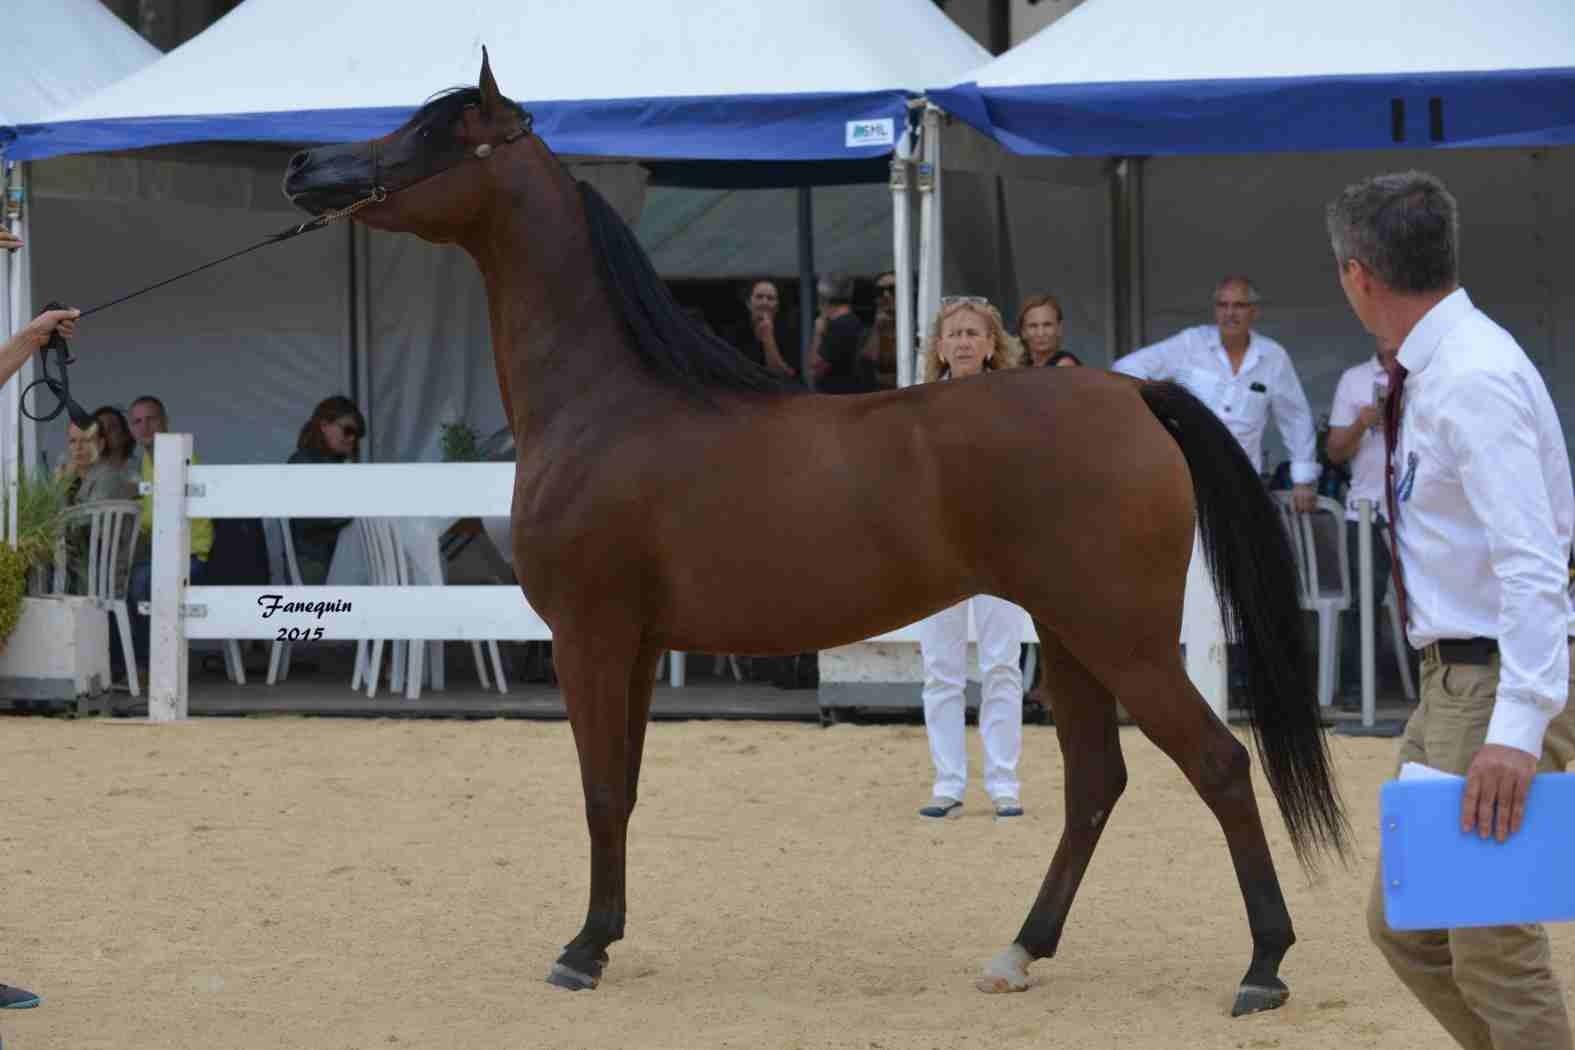 KARAWAN ALBIDAYER en 2015 - Concours national Nîmes prestige - notre sélection - 21